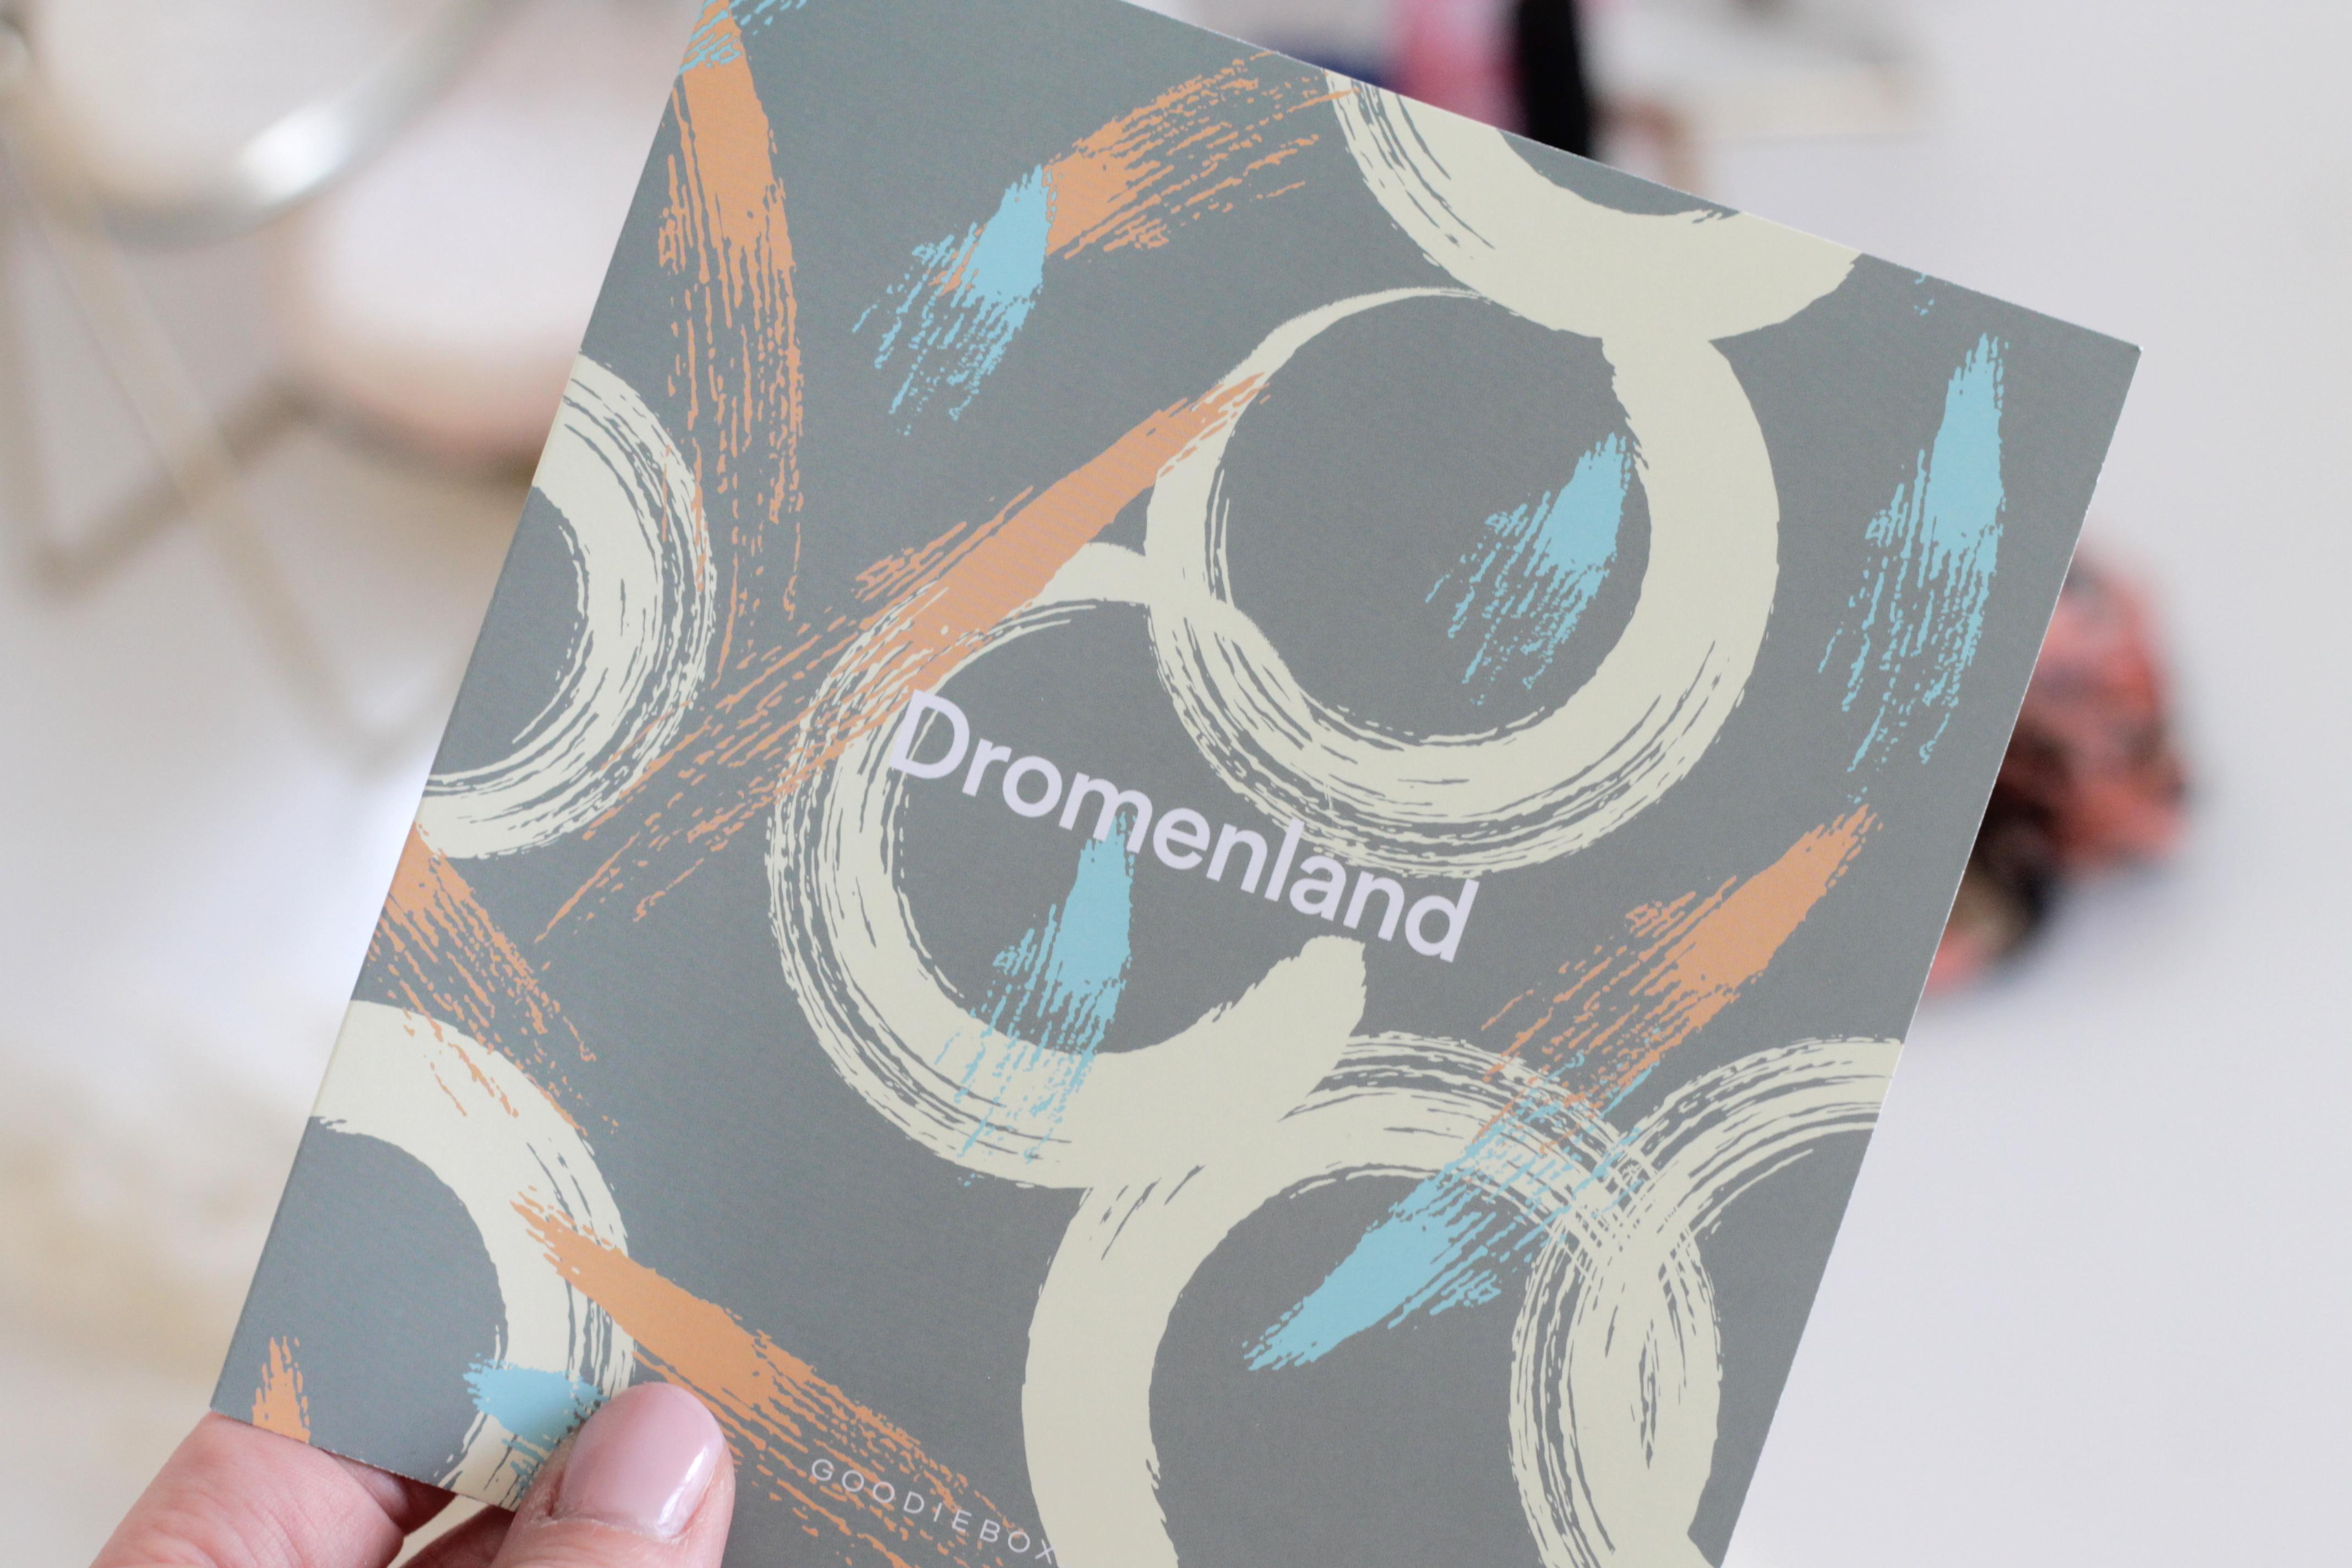 Unboxing Goodiebox Dromenland